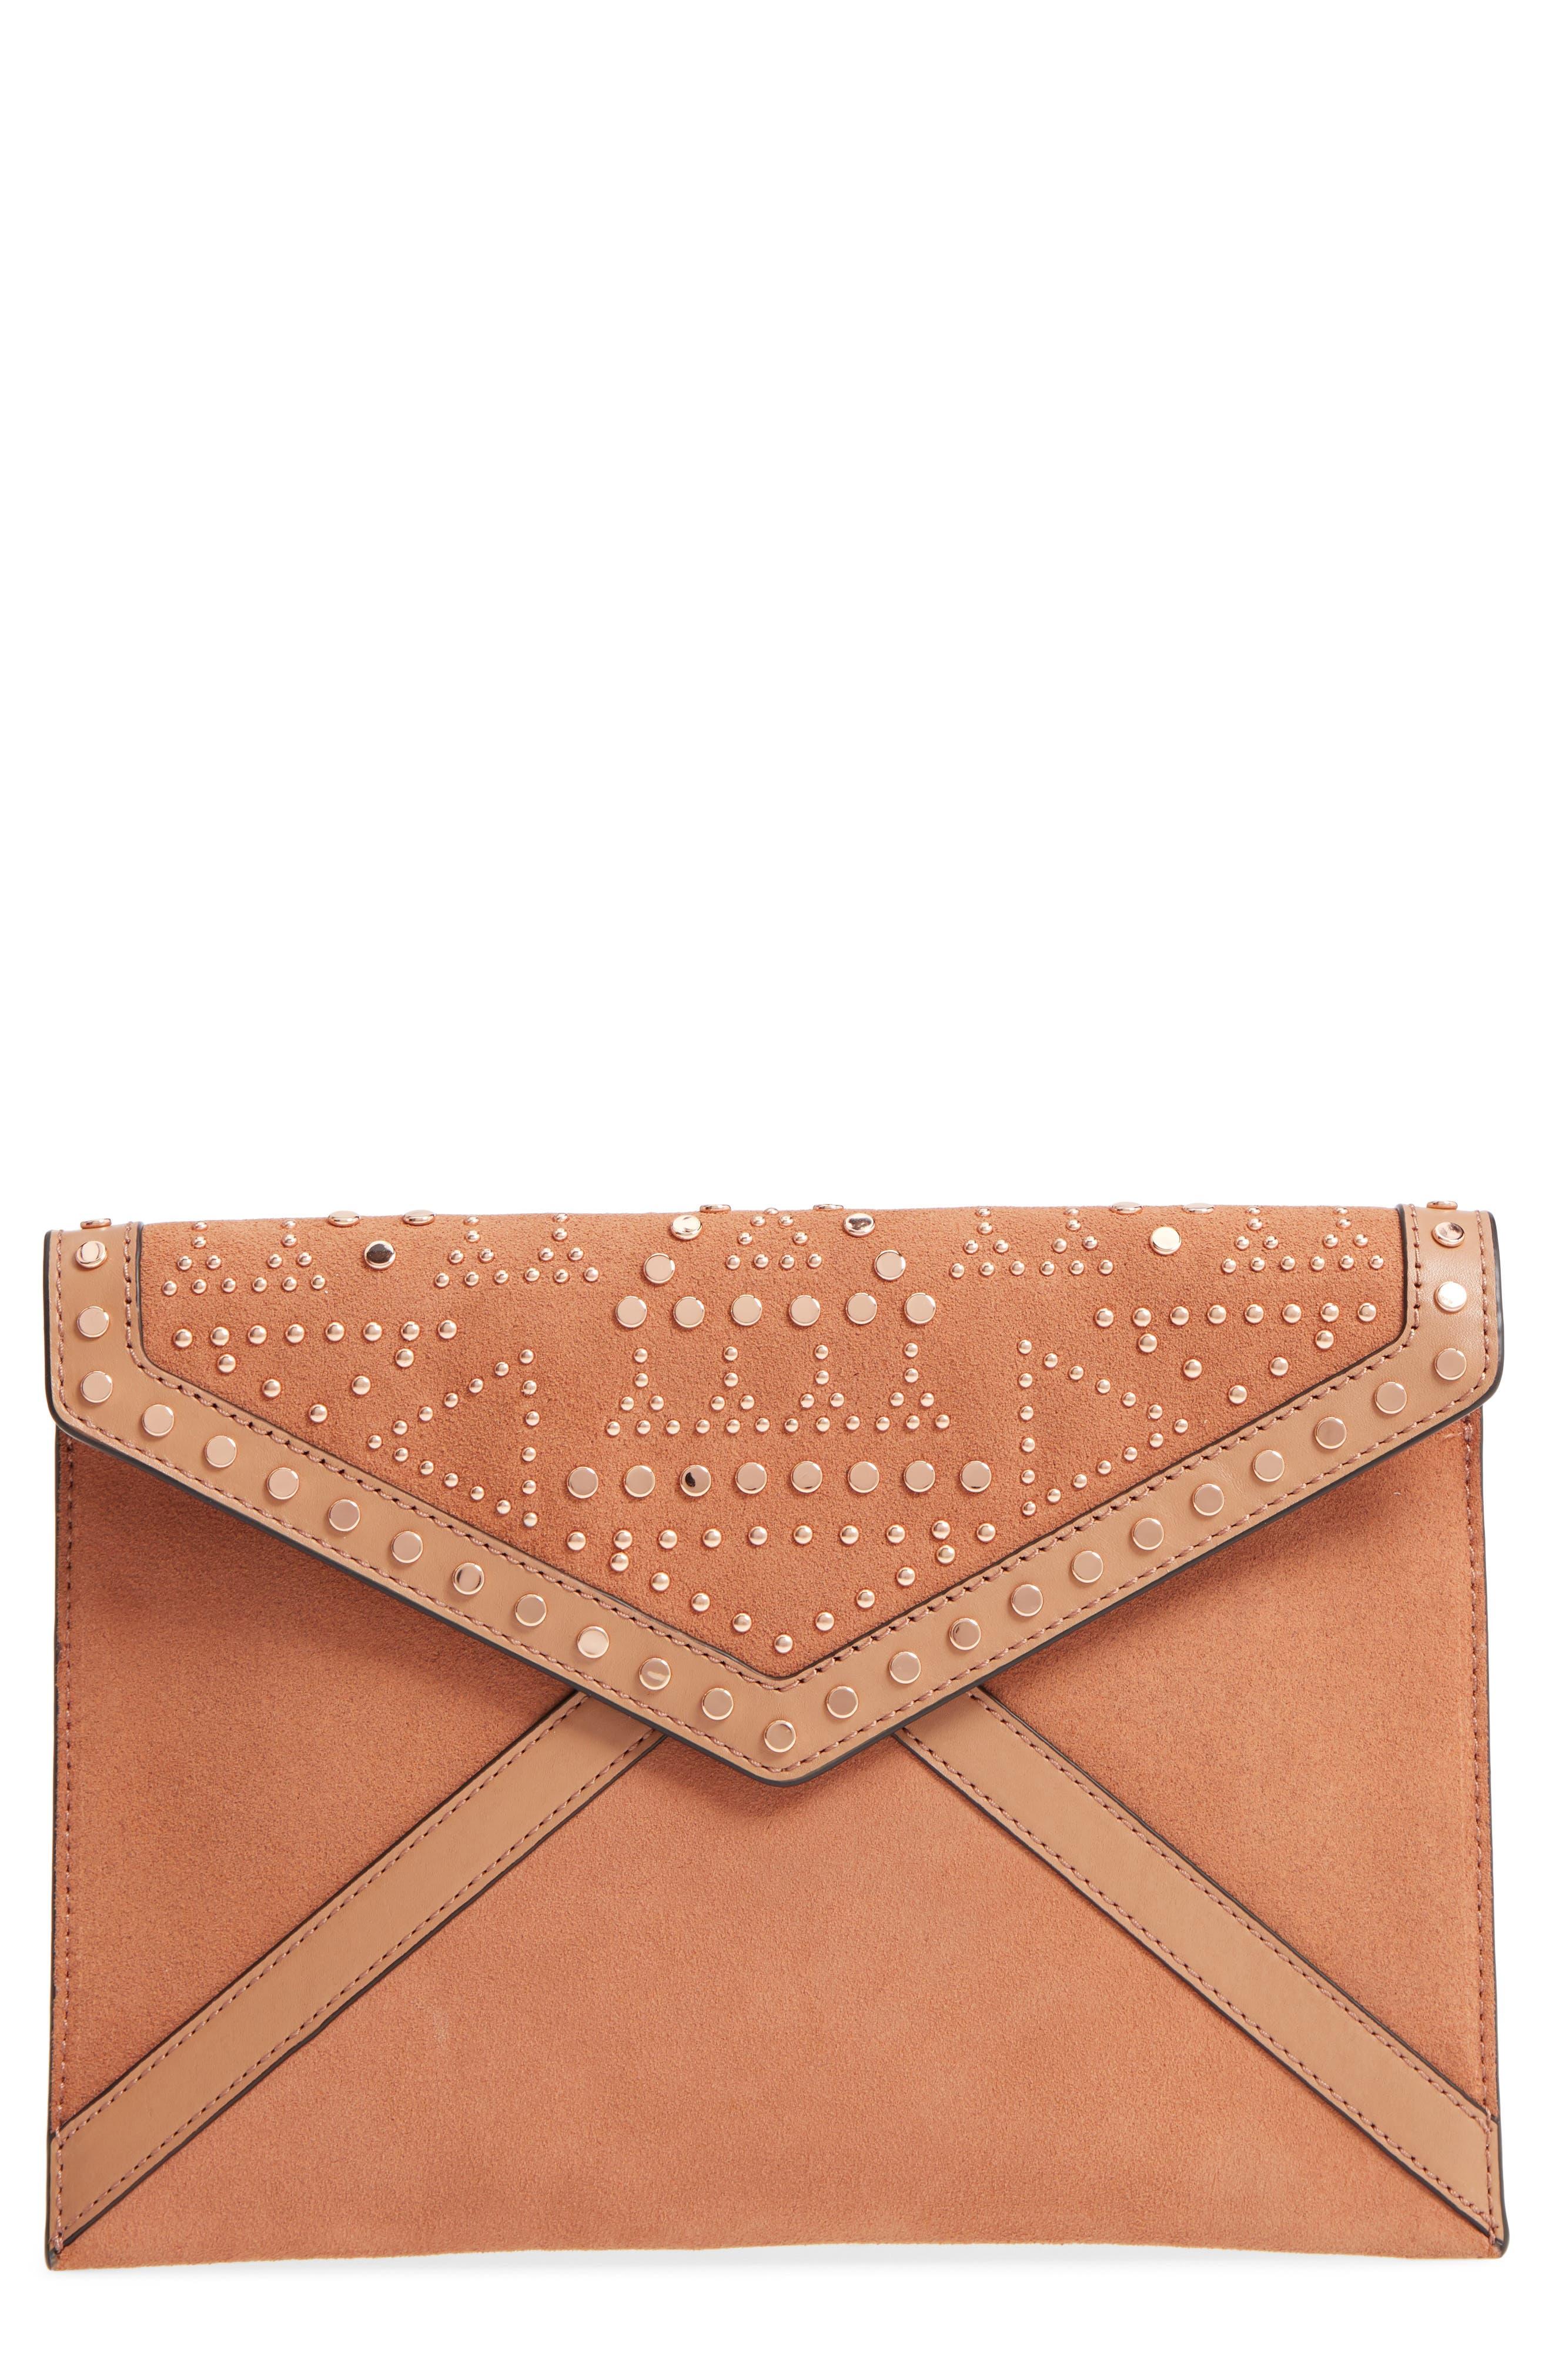 Leo Studded Leather & Suede Clutch,                         Main,                         color, Desert Tan